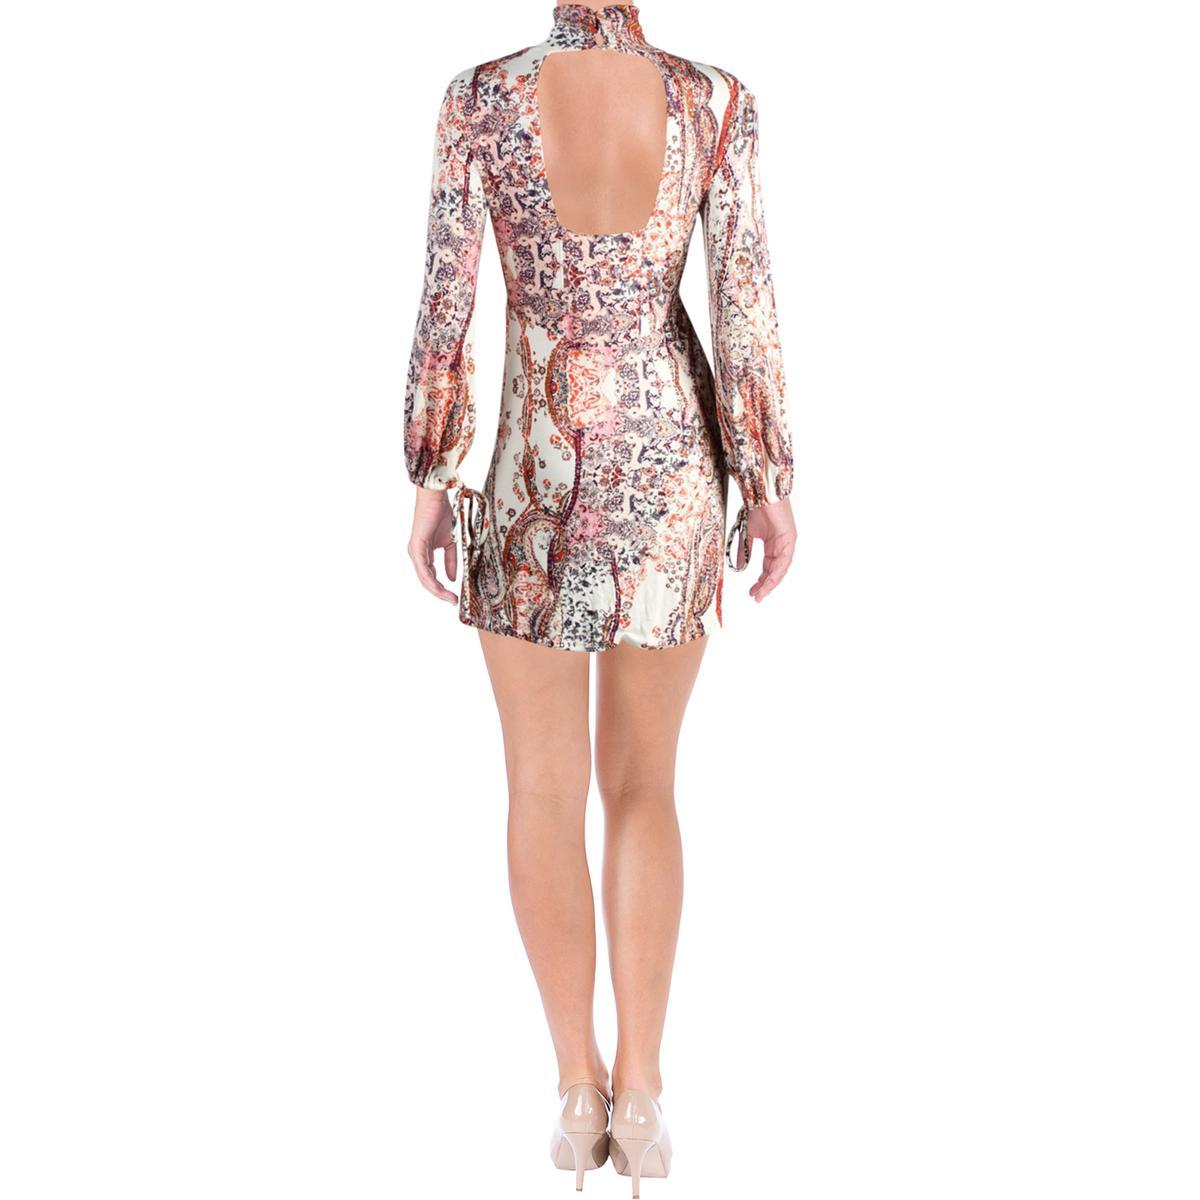 Free People Womens All Dolled Up Paisley High-Neck Boho Mini Dress BHFO 4196